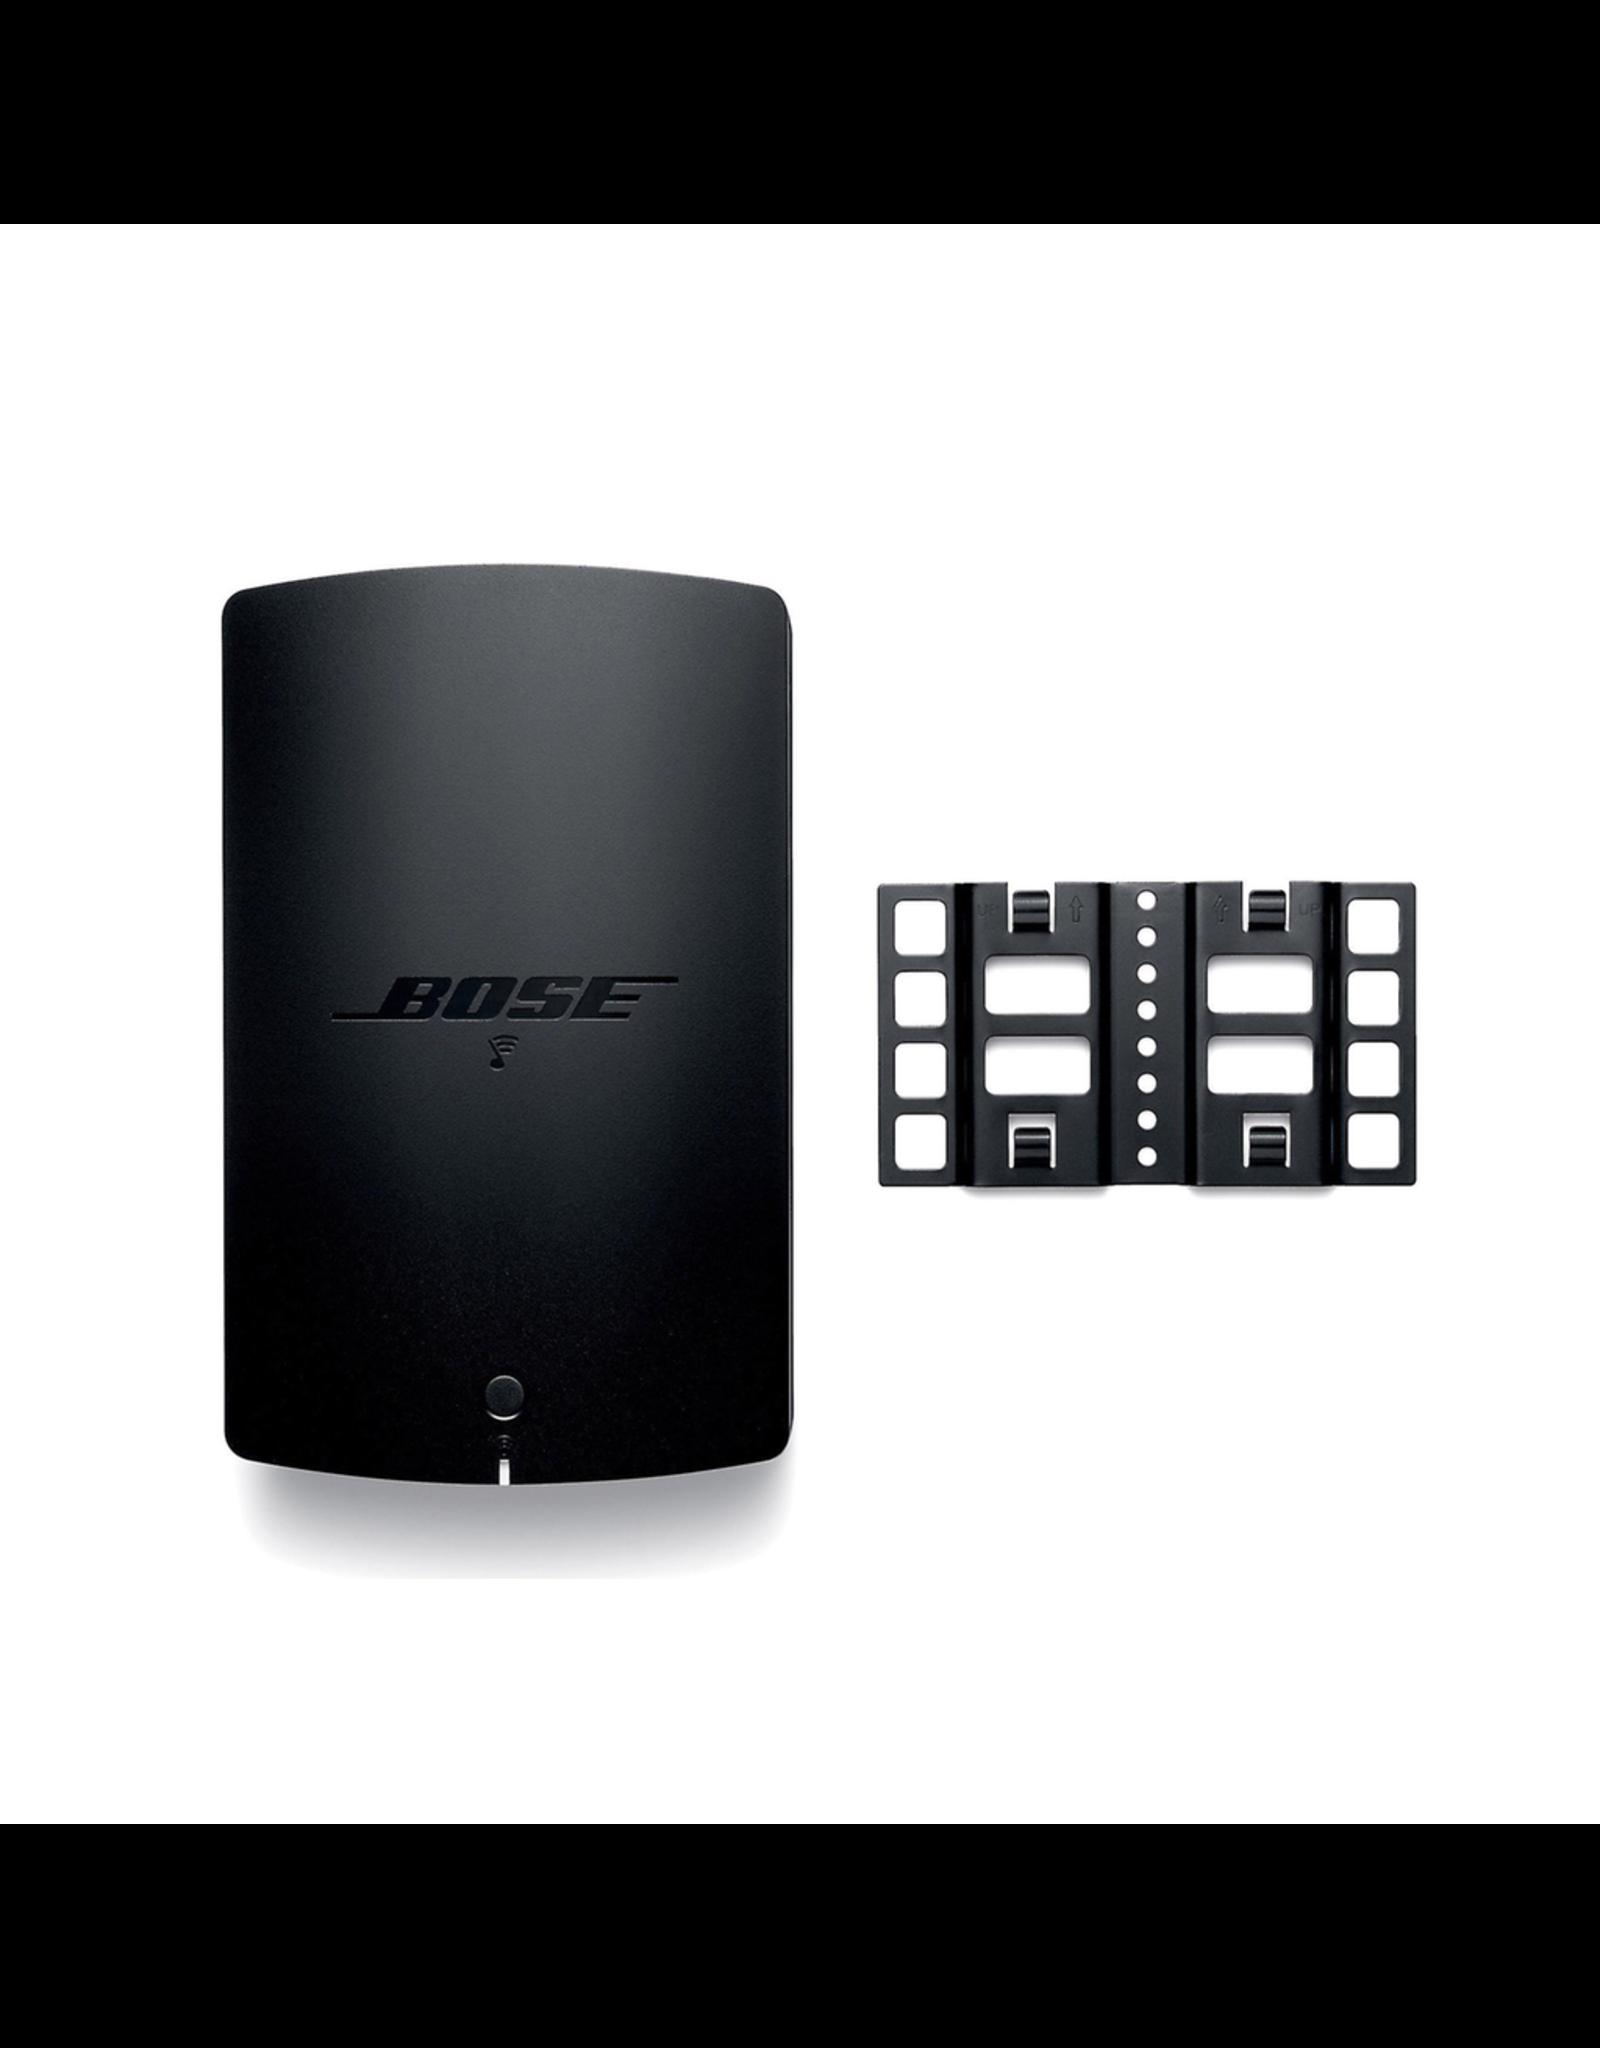 BOSE BOSE Soundtouch SA-5 Amplifier